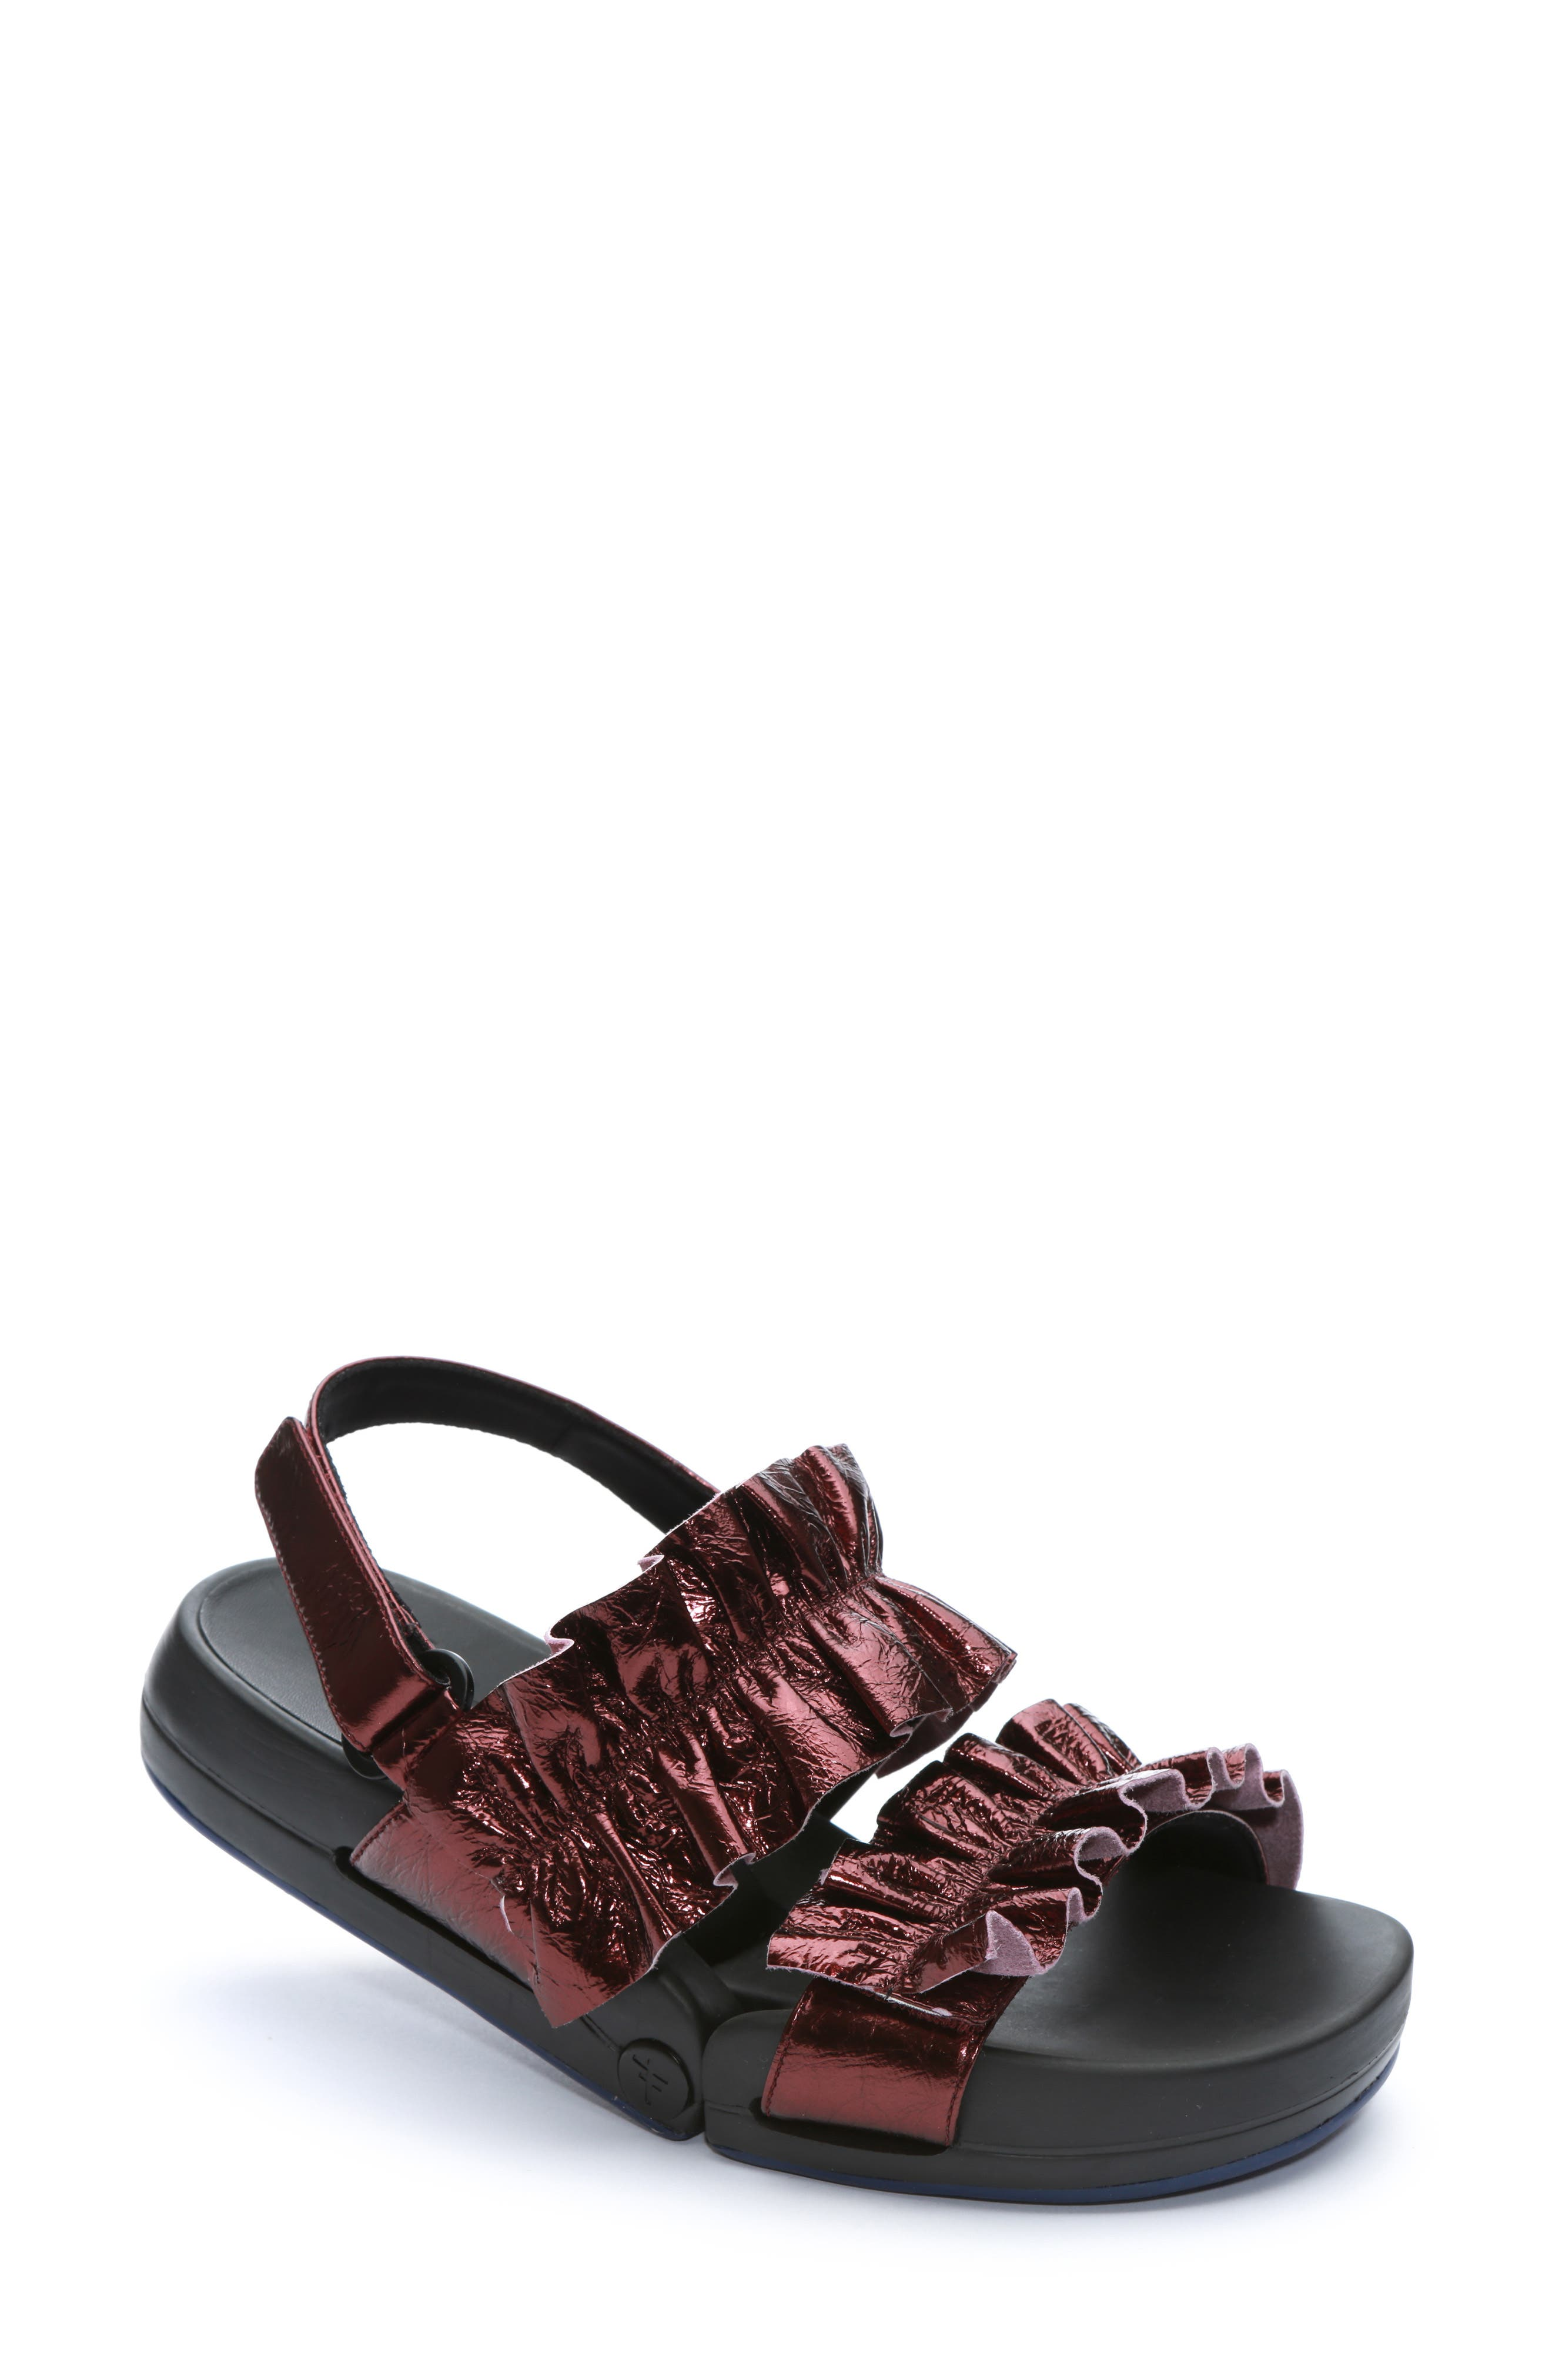 Figulous Ruffle Sandal,                         Main,                         color, BORDEAUX METALLIC LEATHER